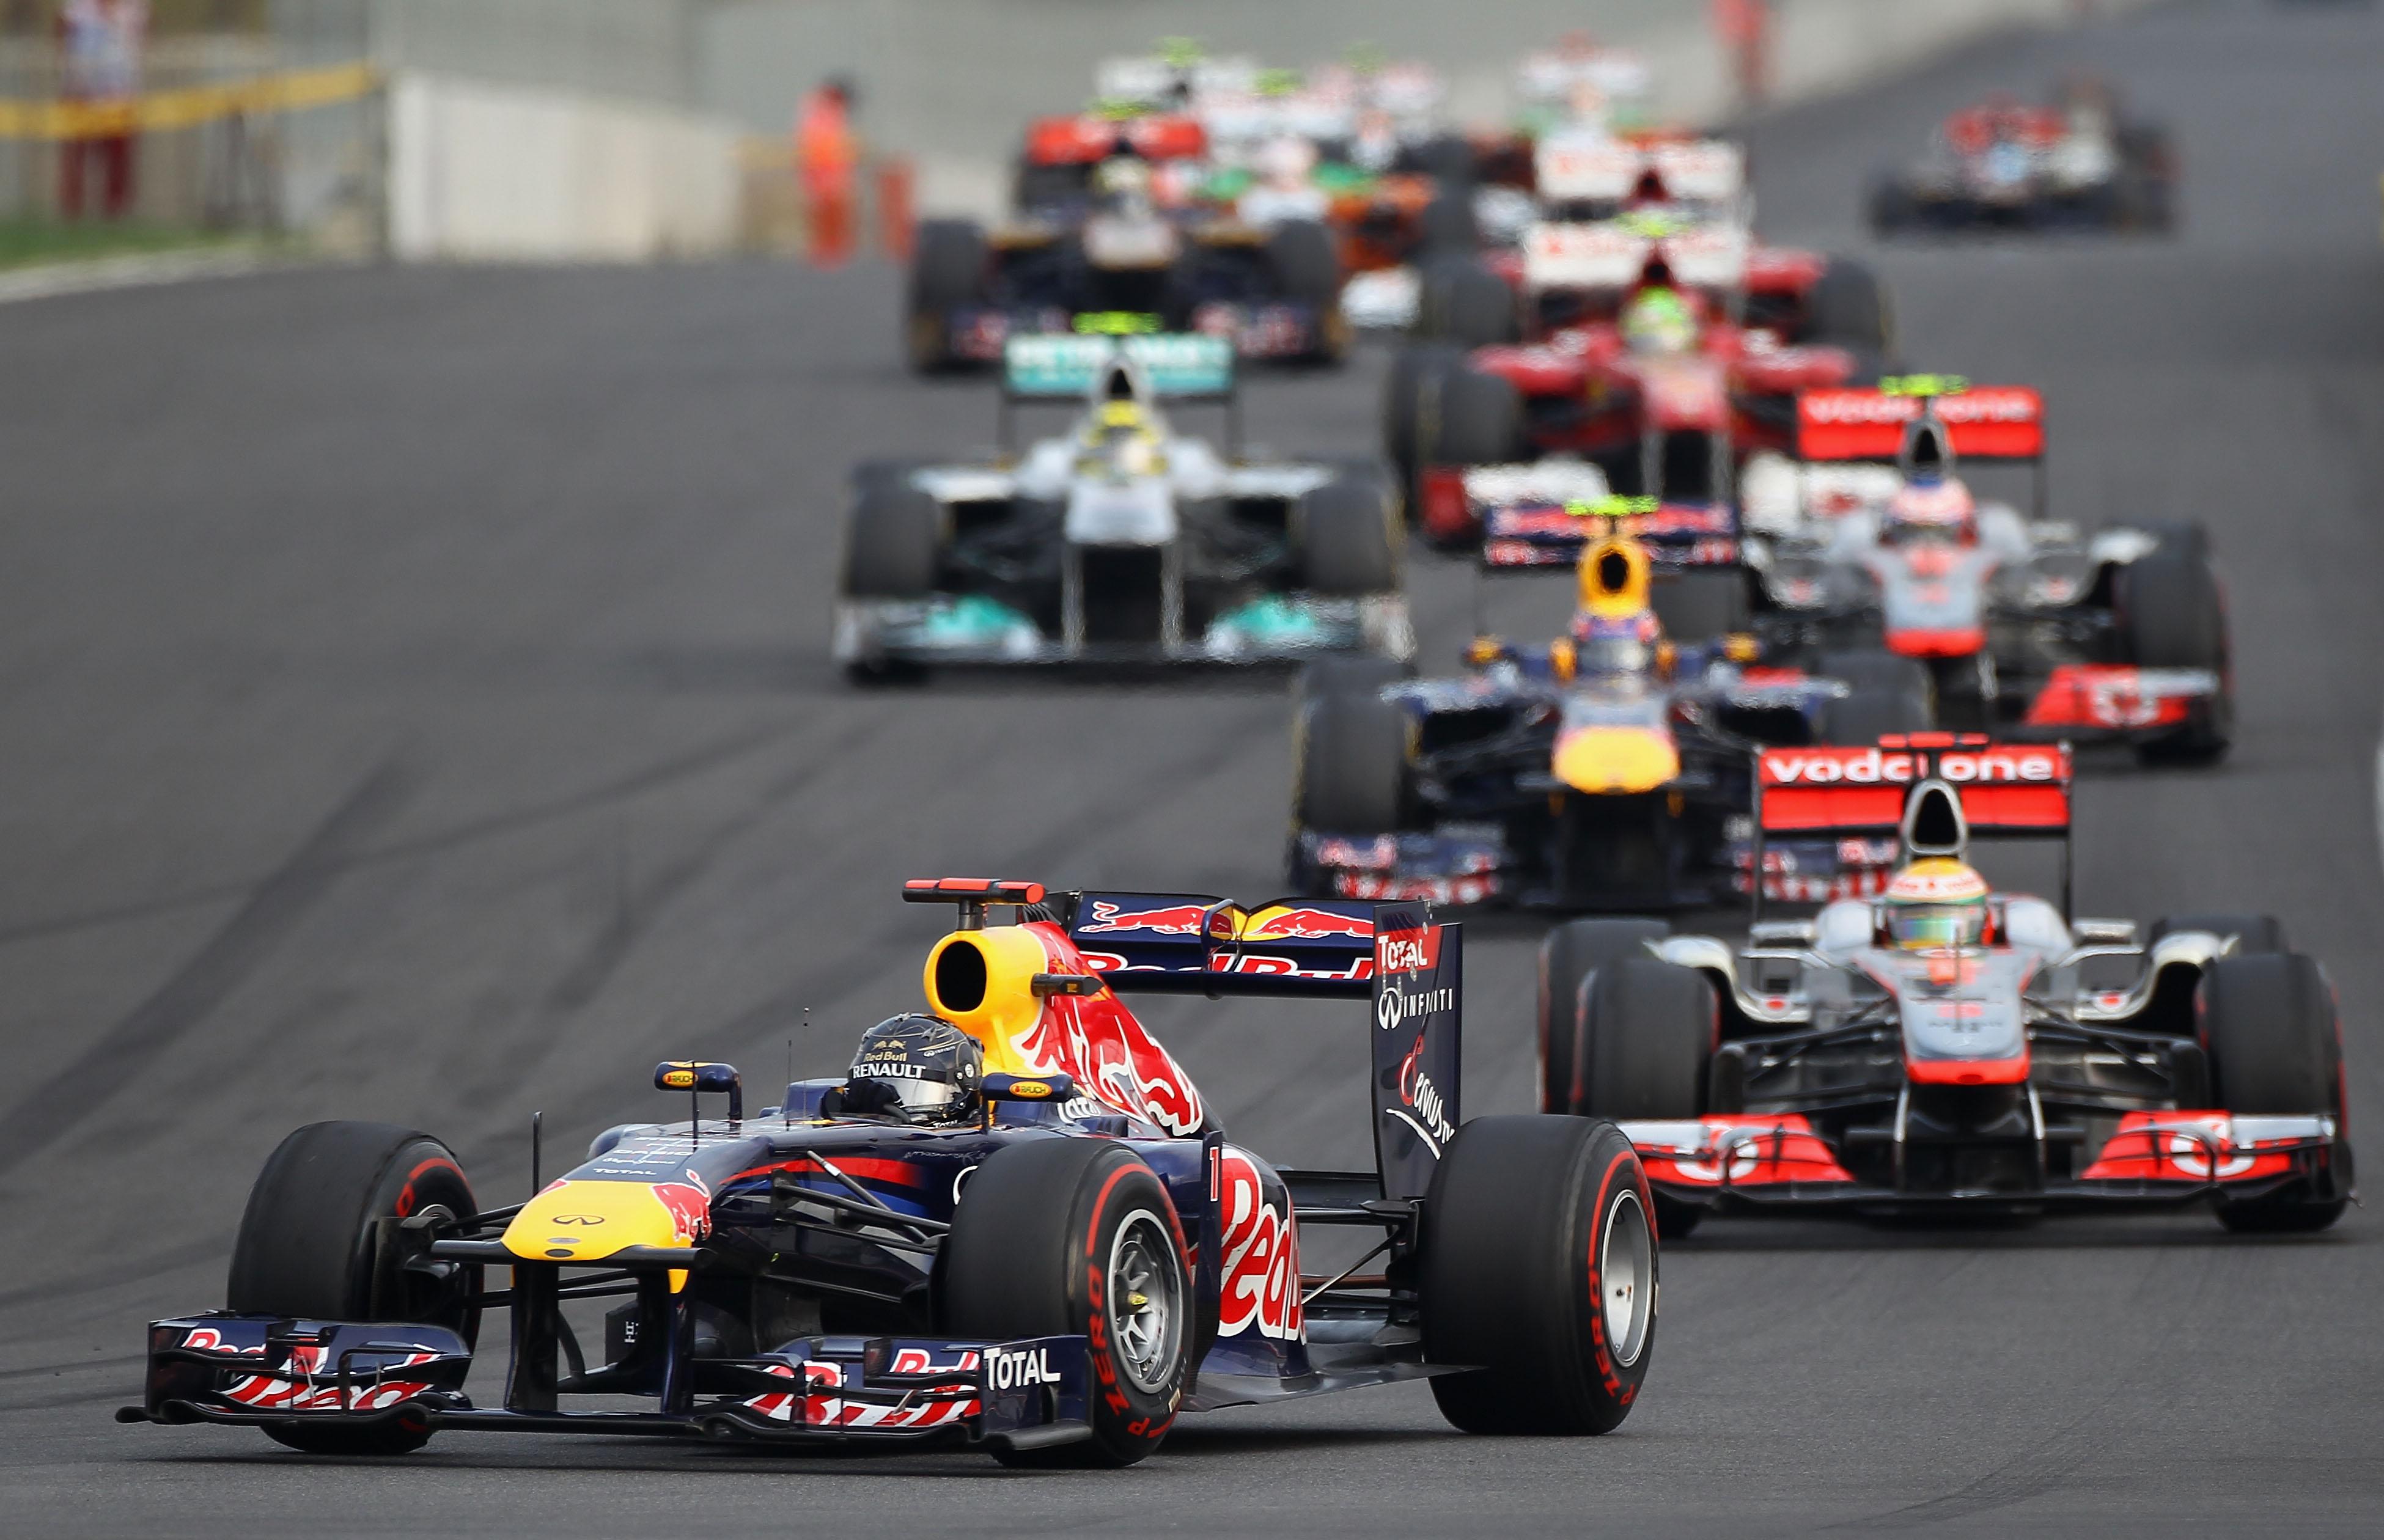 formula One Formula 1 Race Racing F 1 Wallpapers HD Desktop 3900x2520